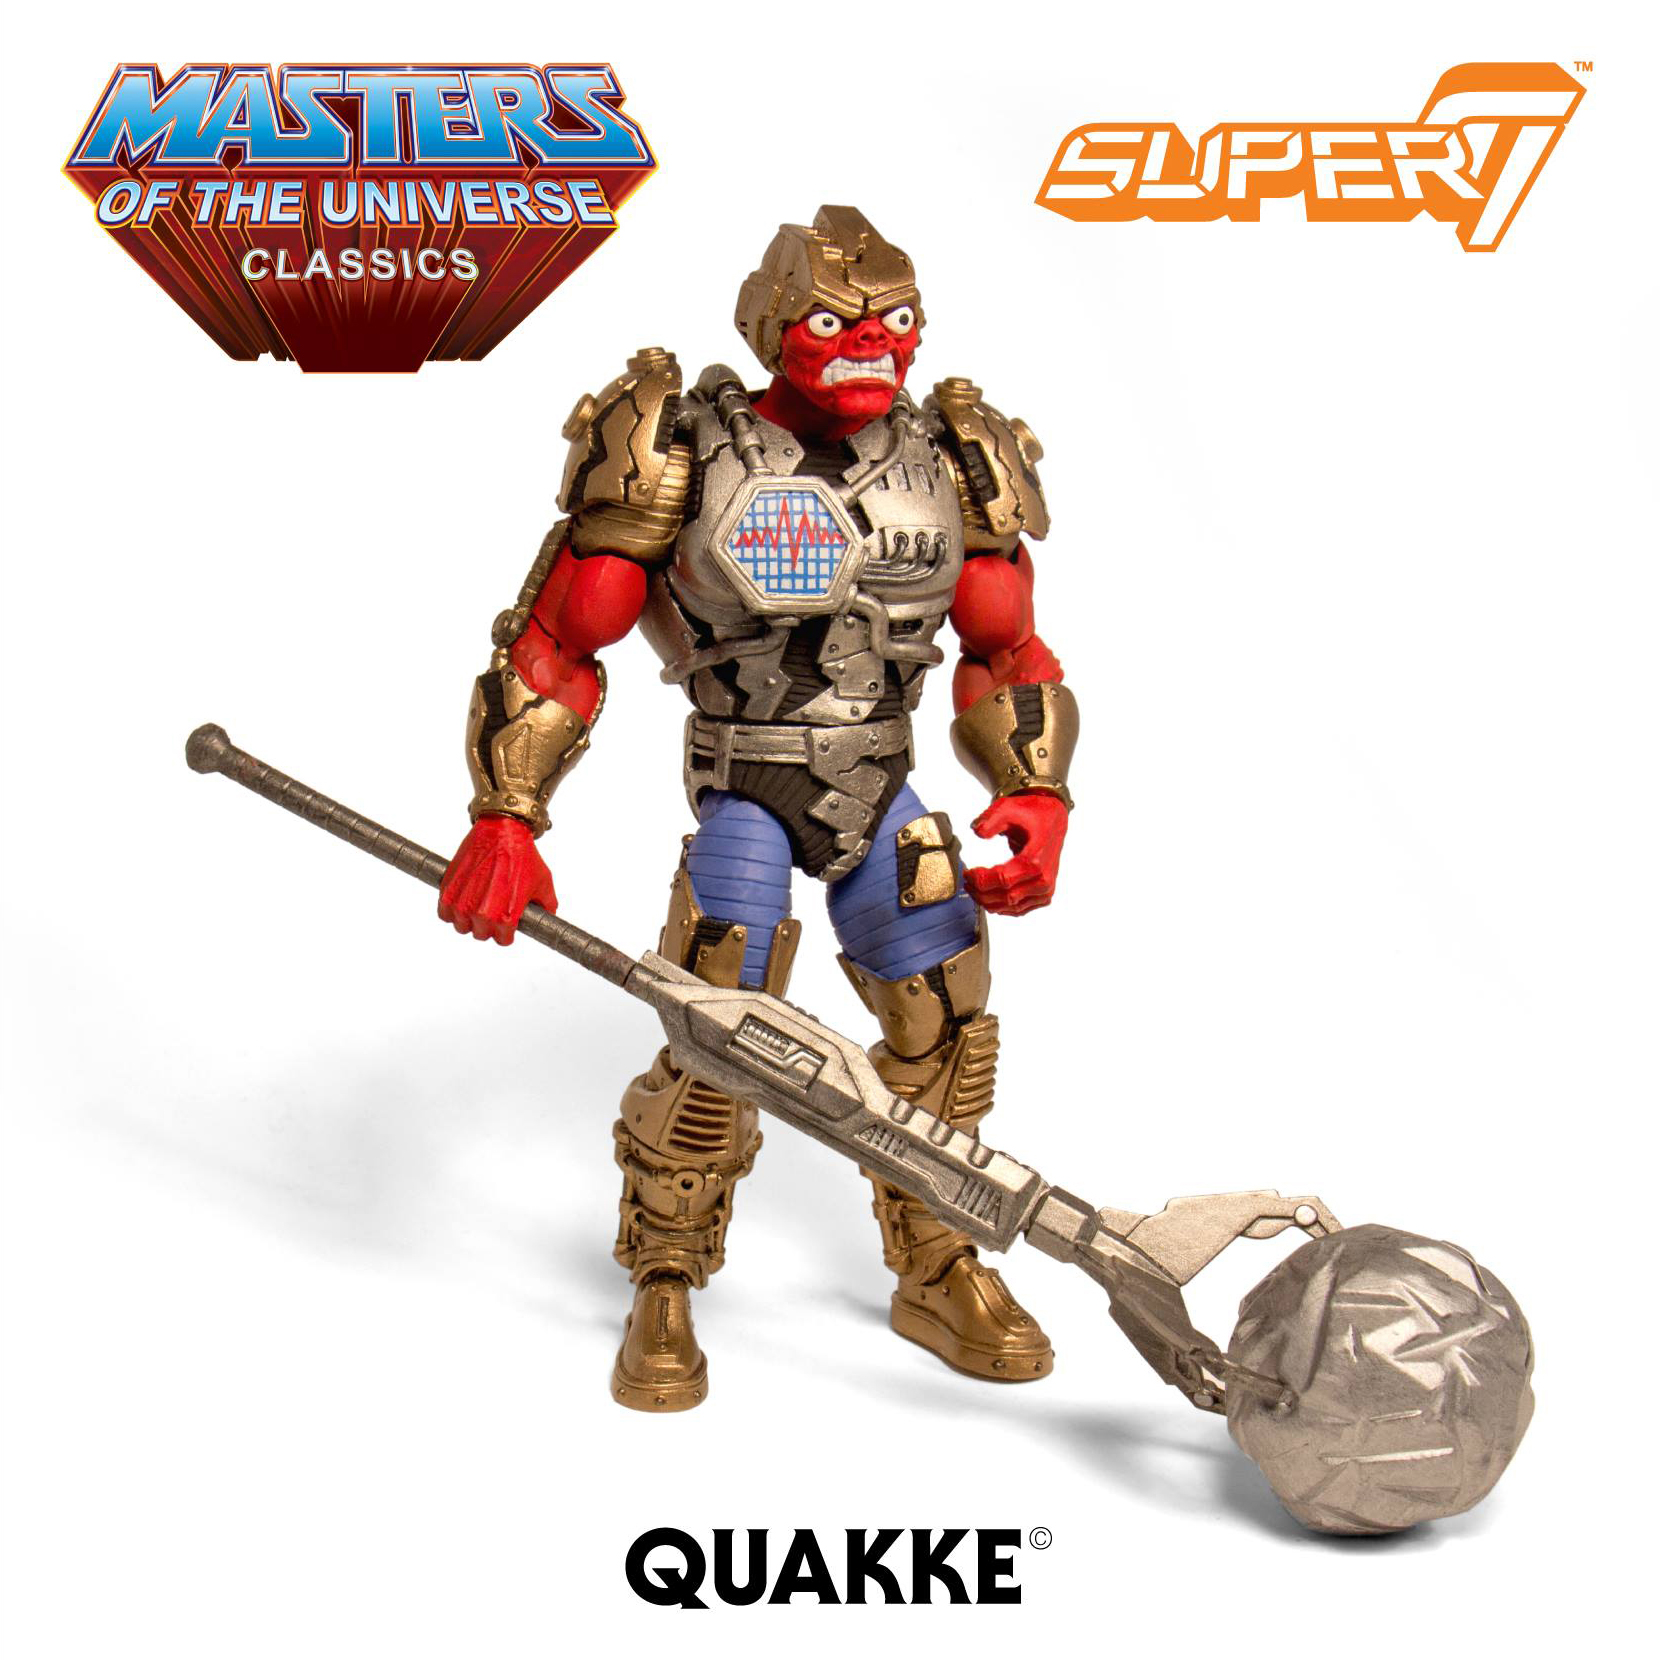 super7-motu-classics-quakke-figure